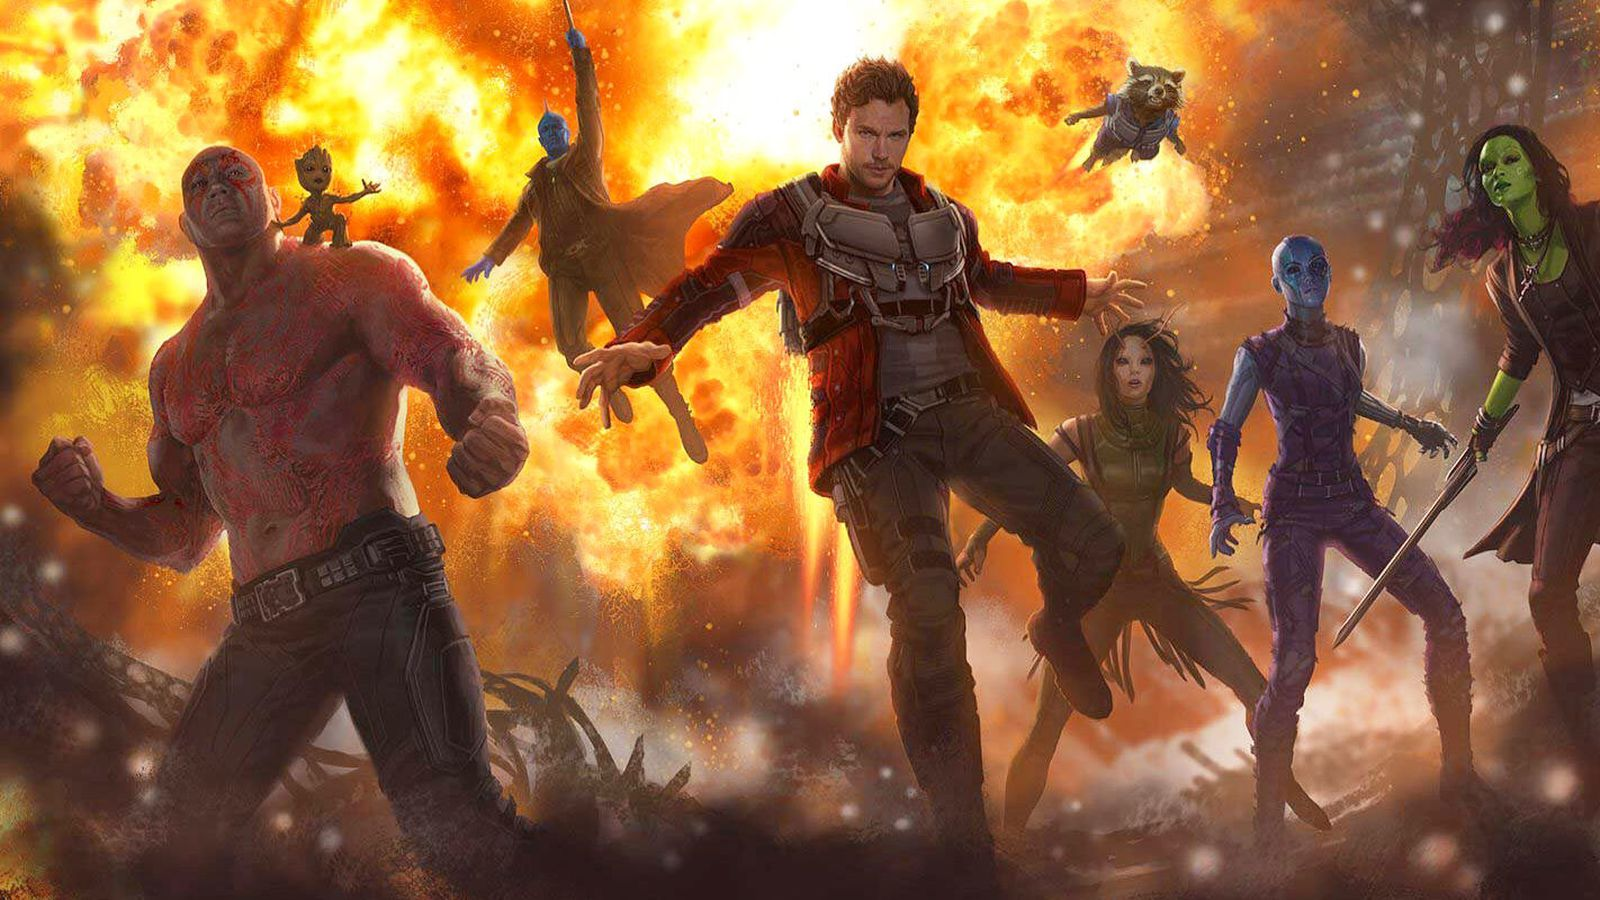 Guardians of the Galaxy Vol. 2 has five post-credit scenes